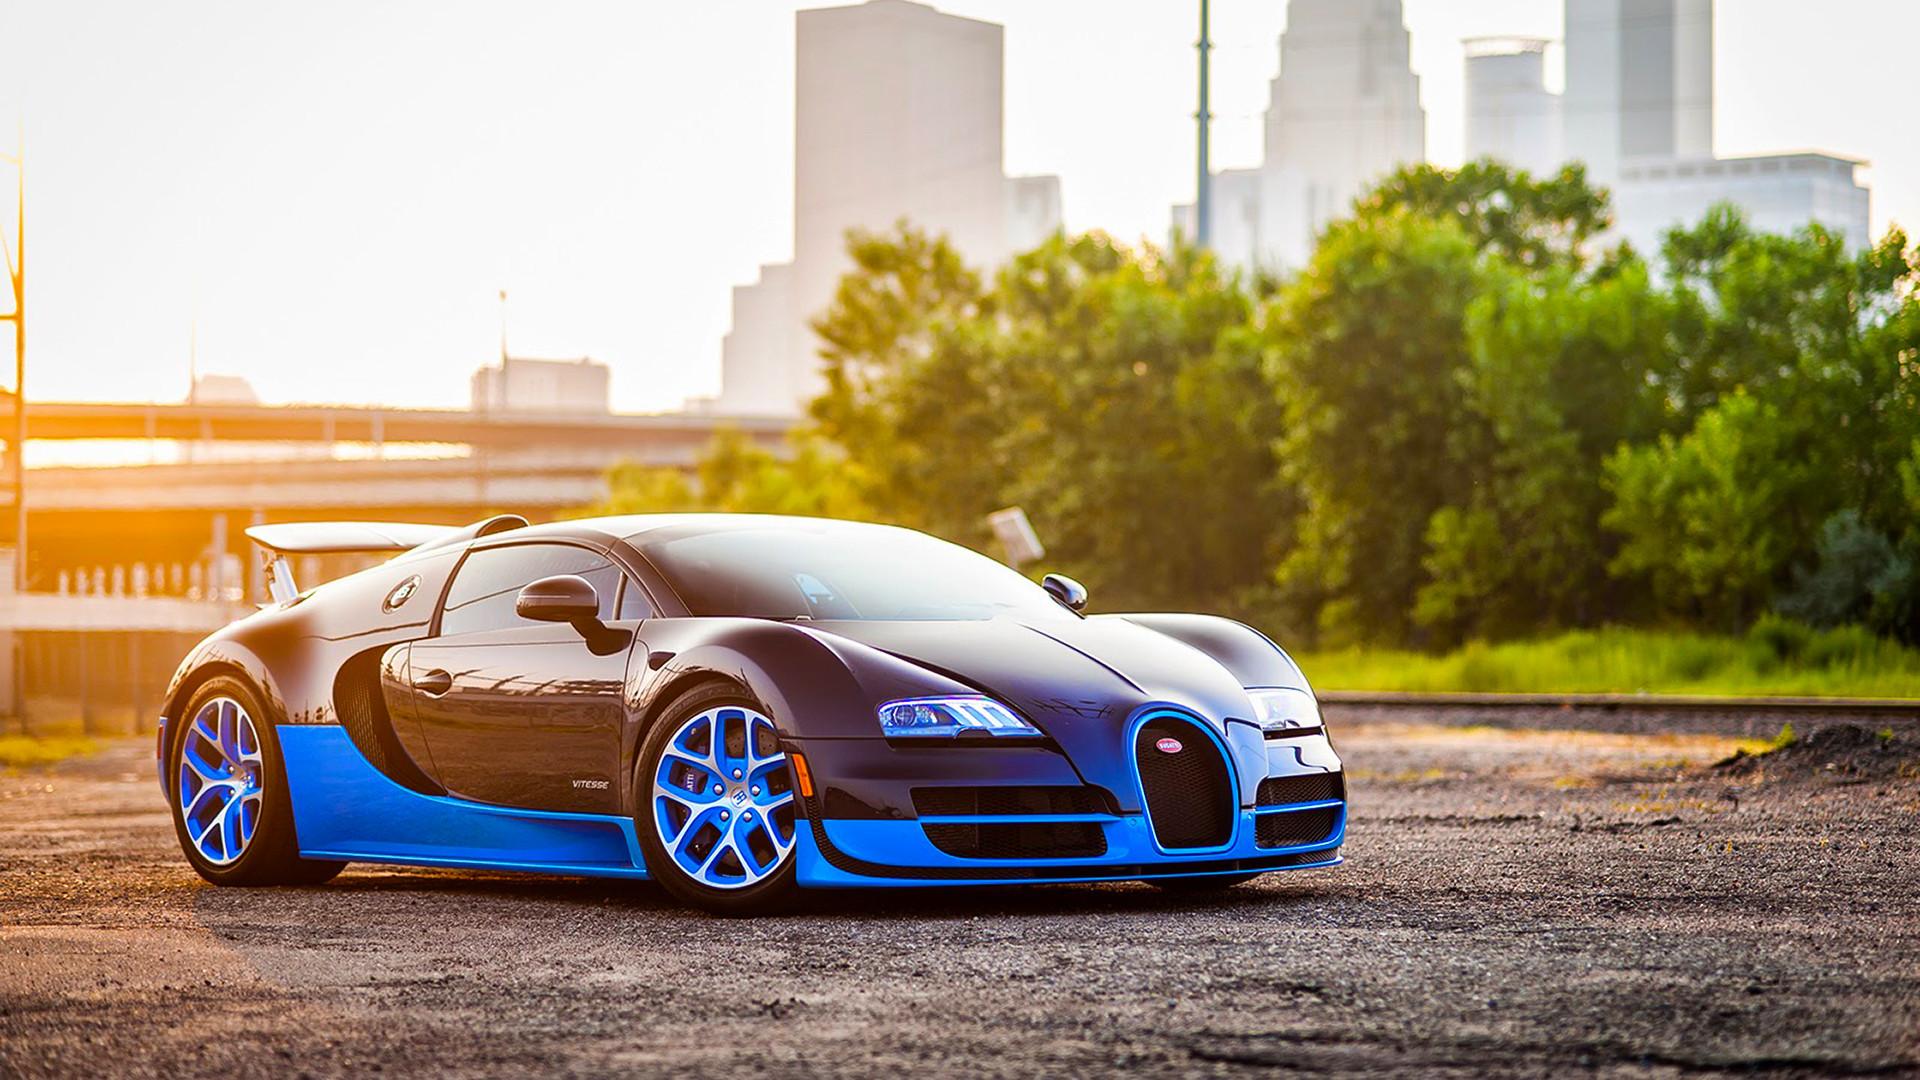 Bugatti Veyron Wallpaper Hd 76 Pictures